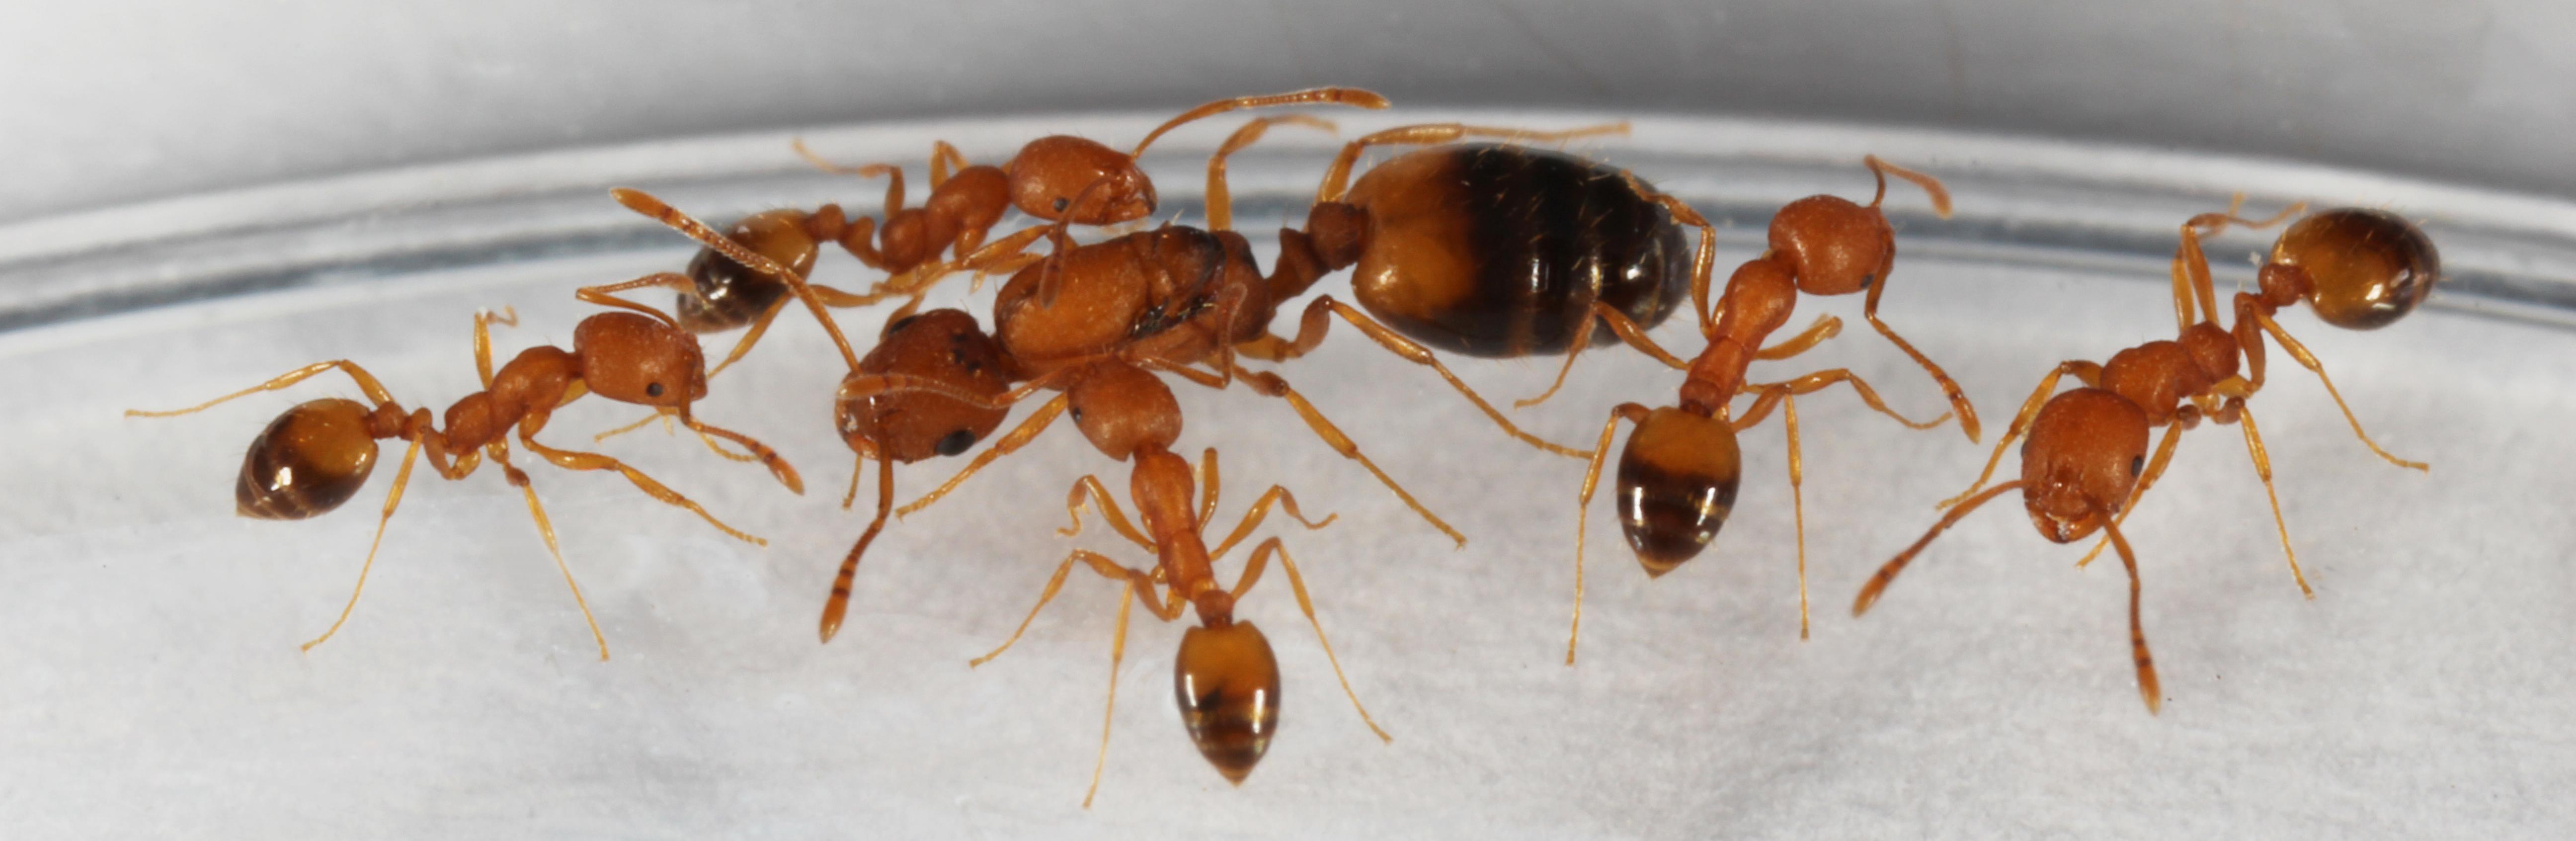 The Pharaoh Ant – Monomorium Pharaonis – Linksvayer Lab